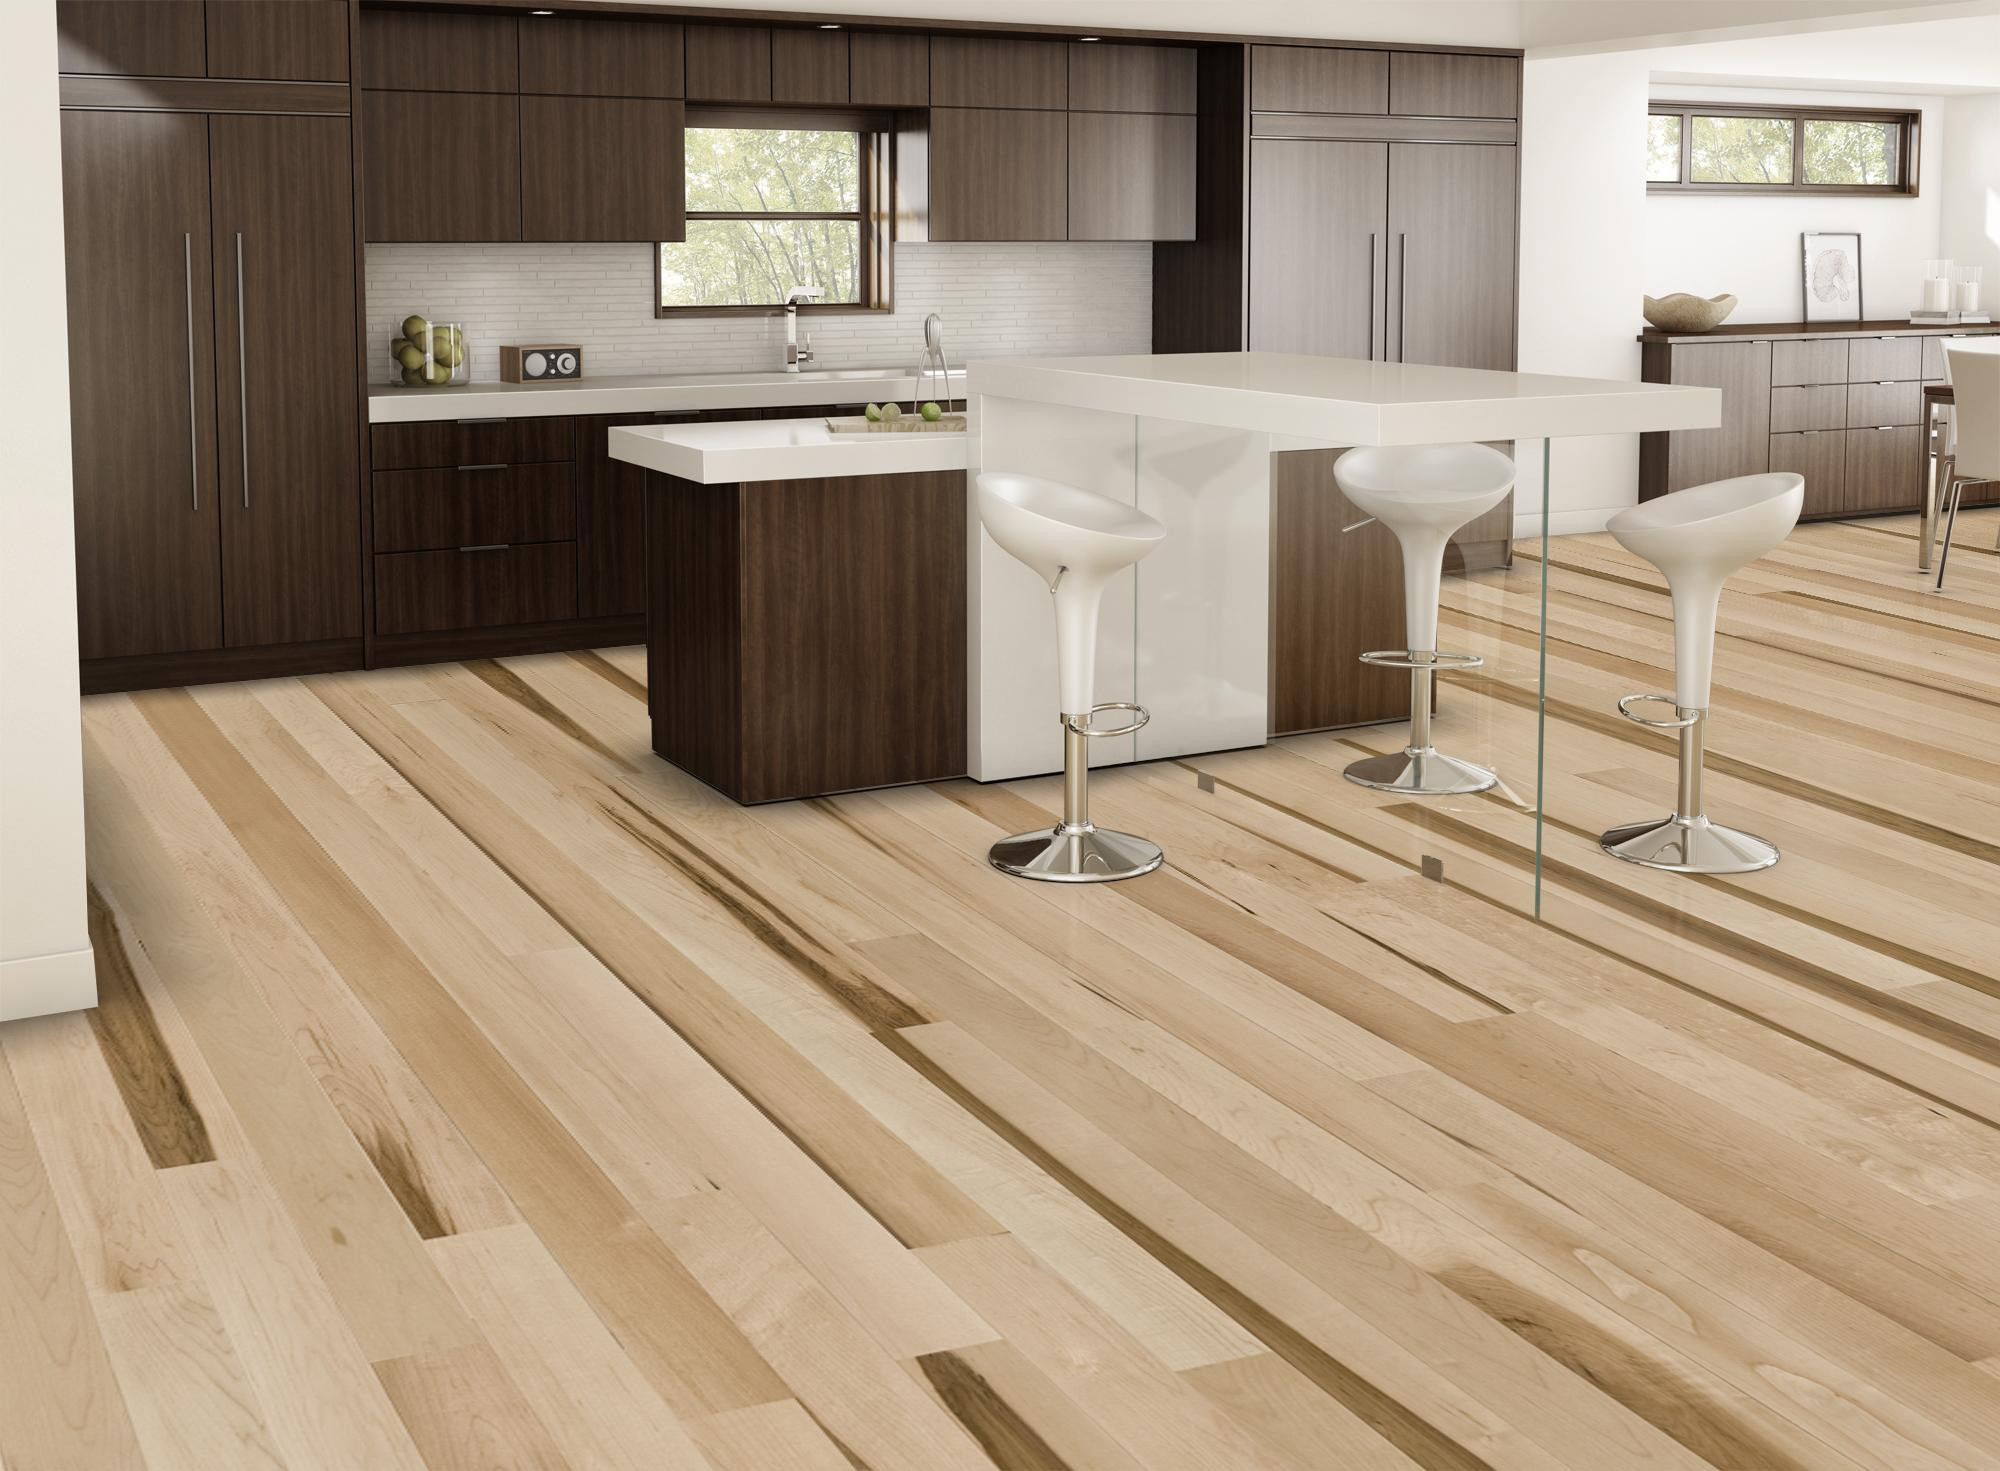 extra wide plank hardwood flooring of kingsmill natural maple 4 wide 3 4 solid hardwood flooring with regard to kingsmill natural maple 4 wide 3 4 solid hardwood flooring room